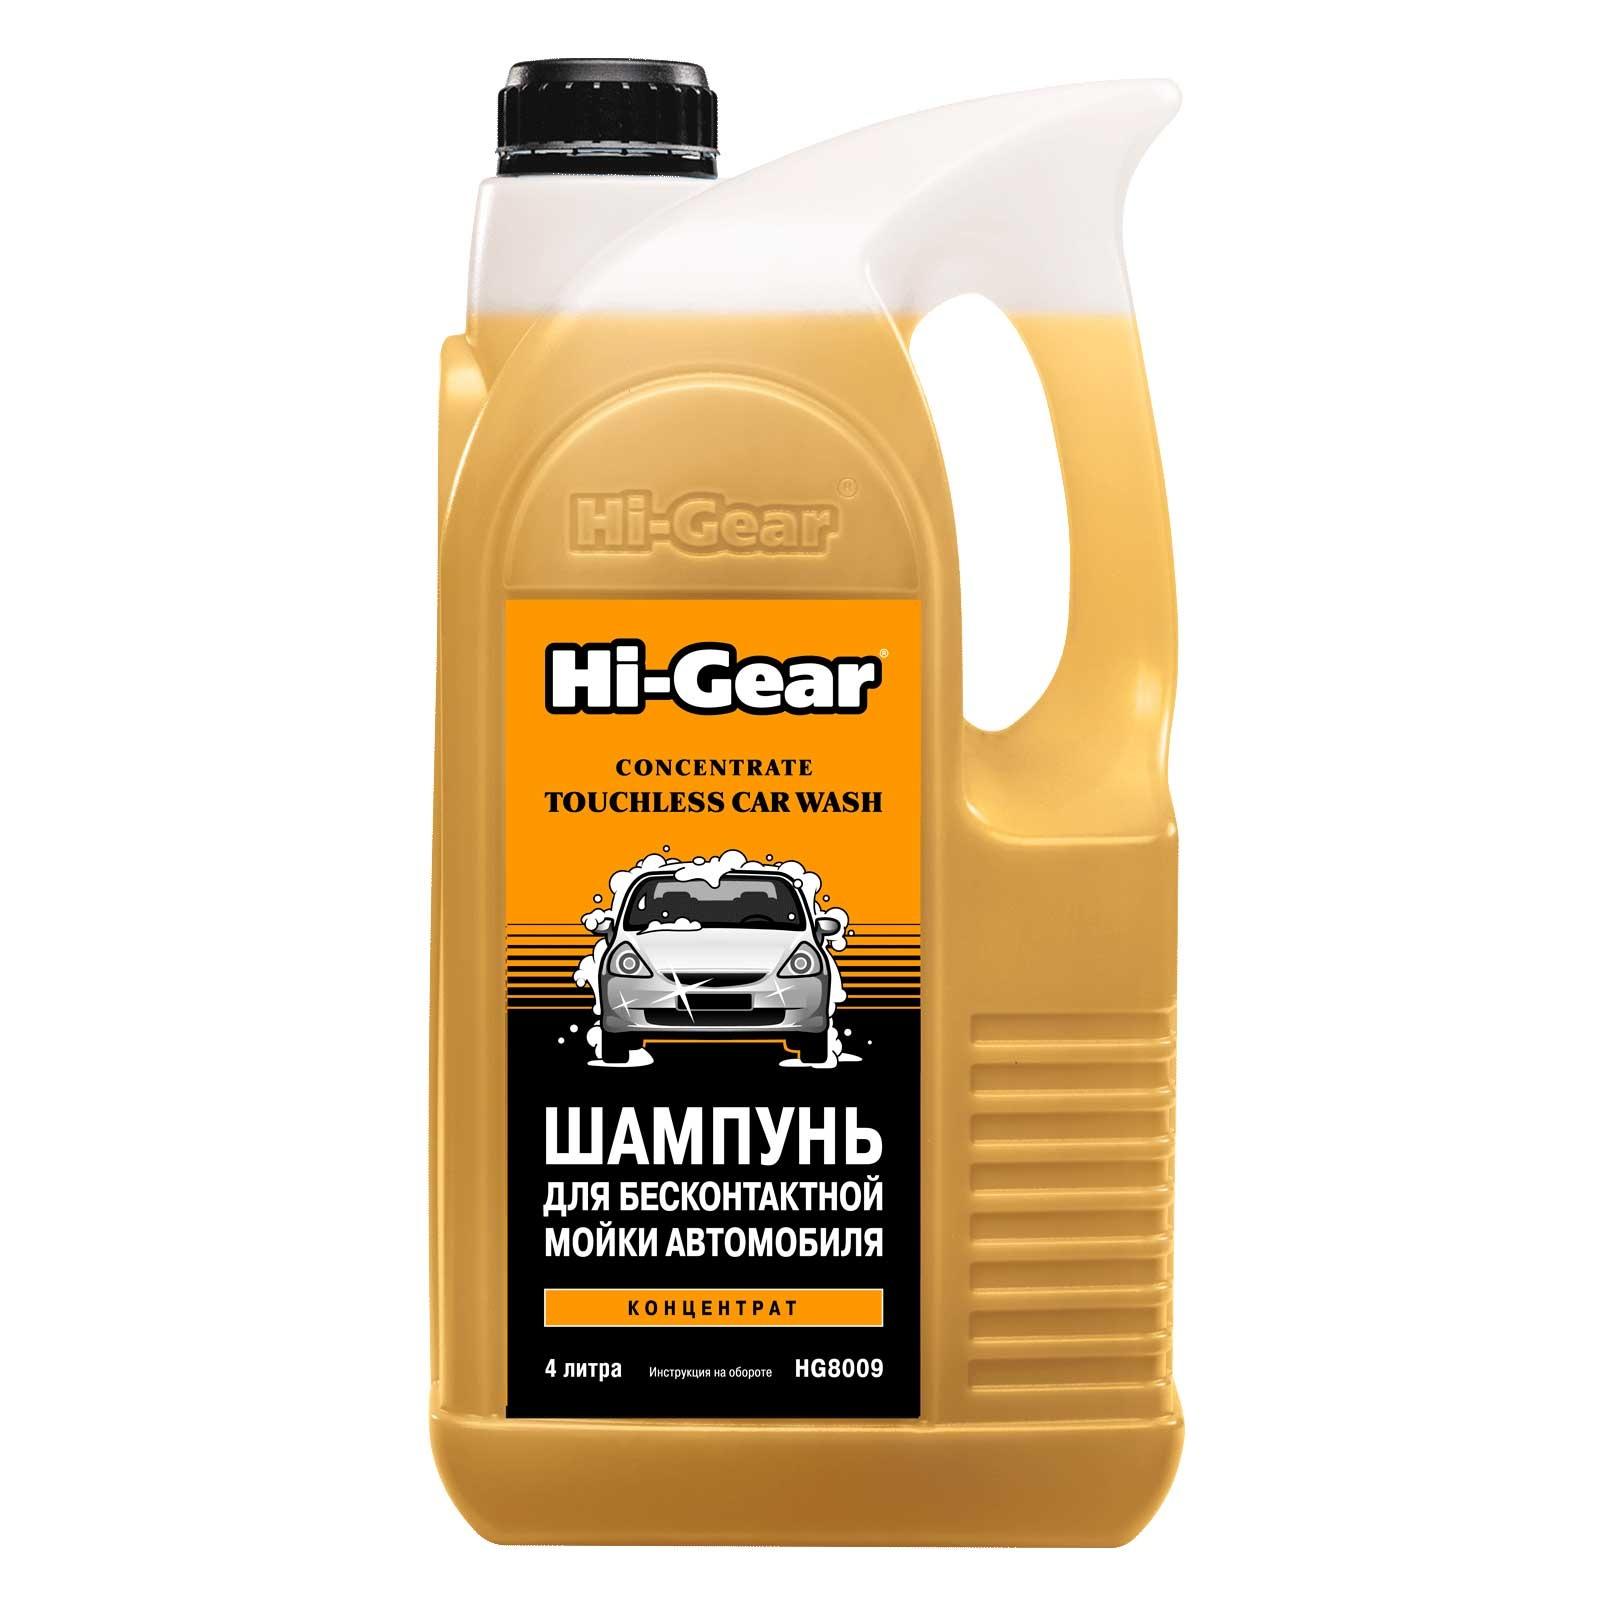 Шампунь-концентрат Hi-gear для мойки автомобиля 5 л